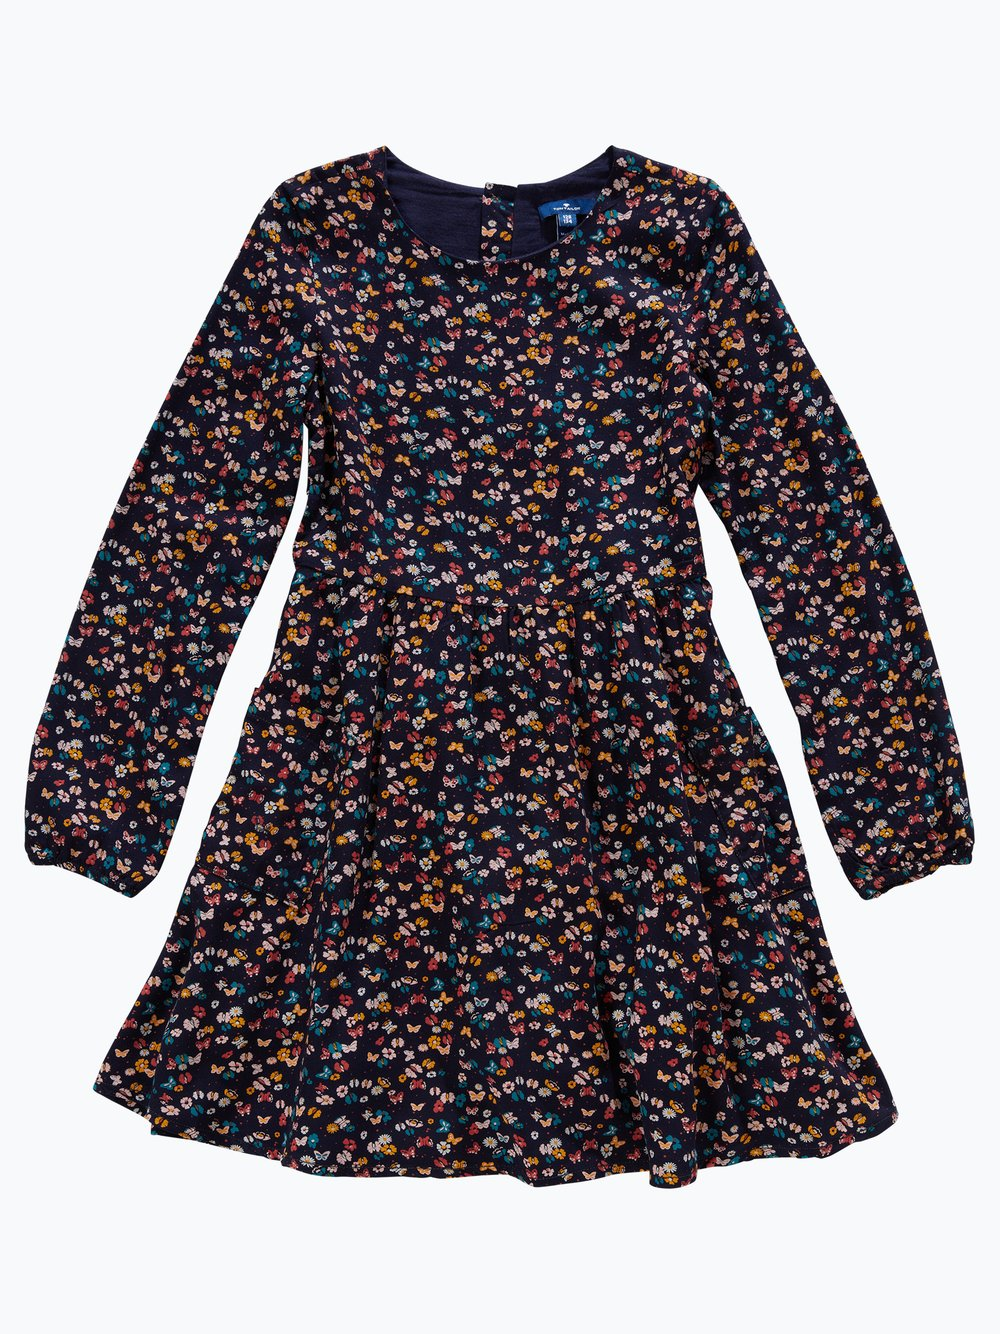 Tom kaufenVANGRAAF Tailor Kleid Mädchen online COM qULMVpGzS